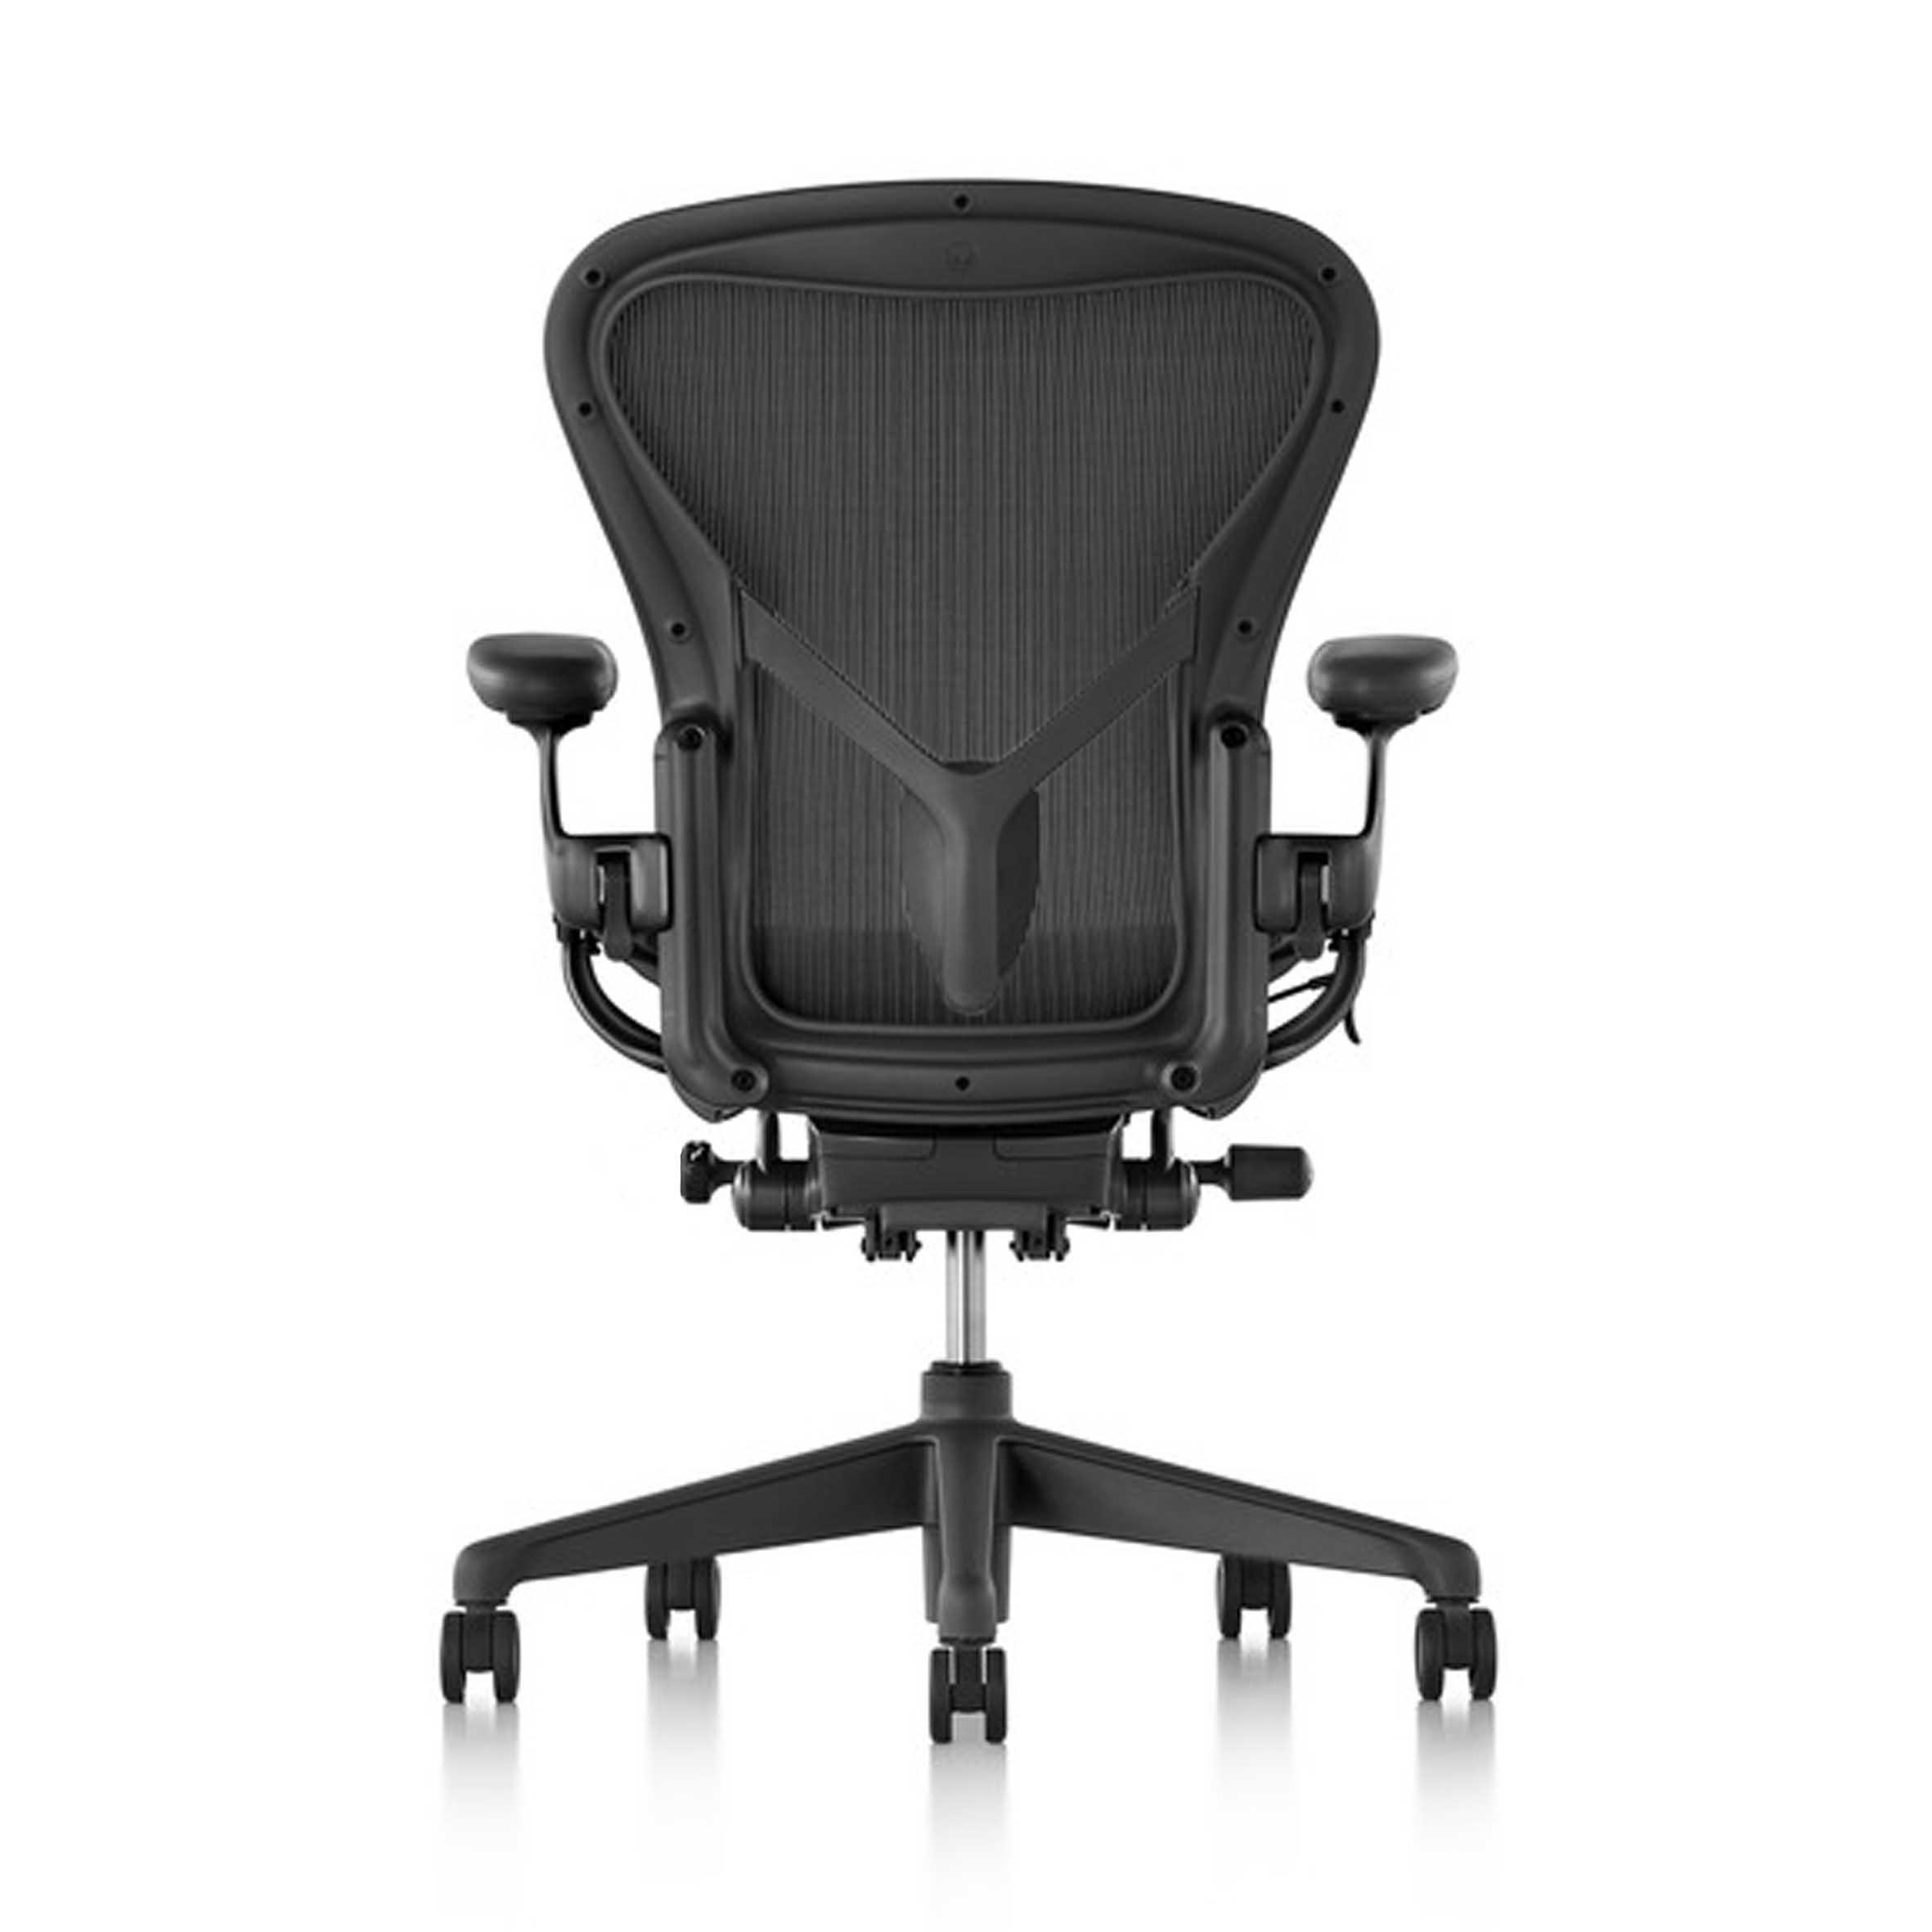 【Herman MIller正規販売店】Aeron Chair Remastered Light アーロンチェア リマスタード ライト